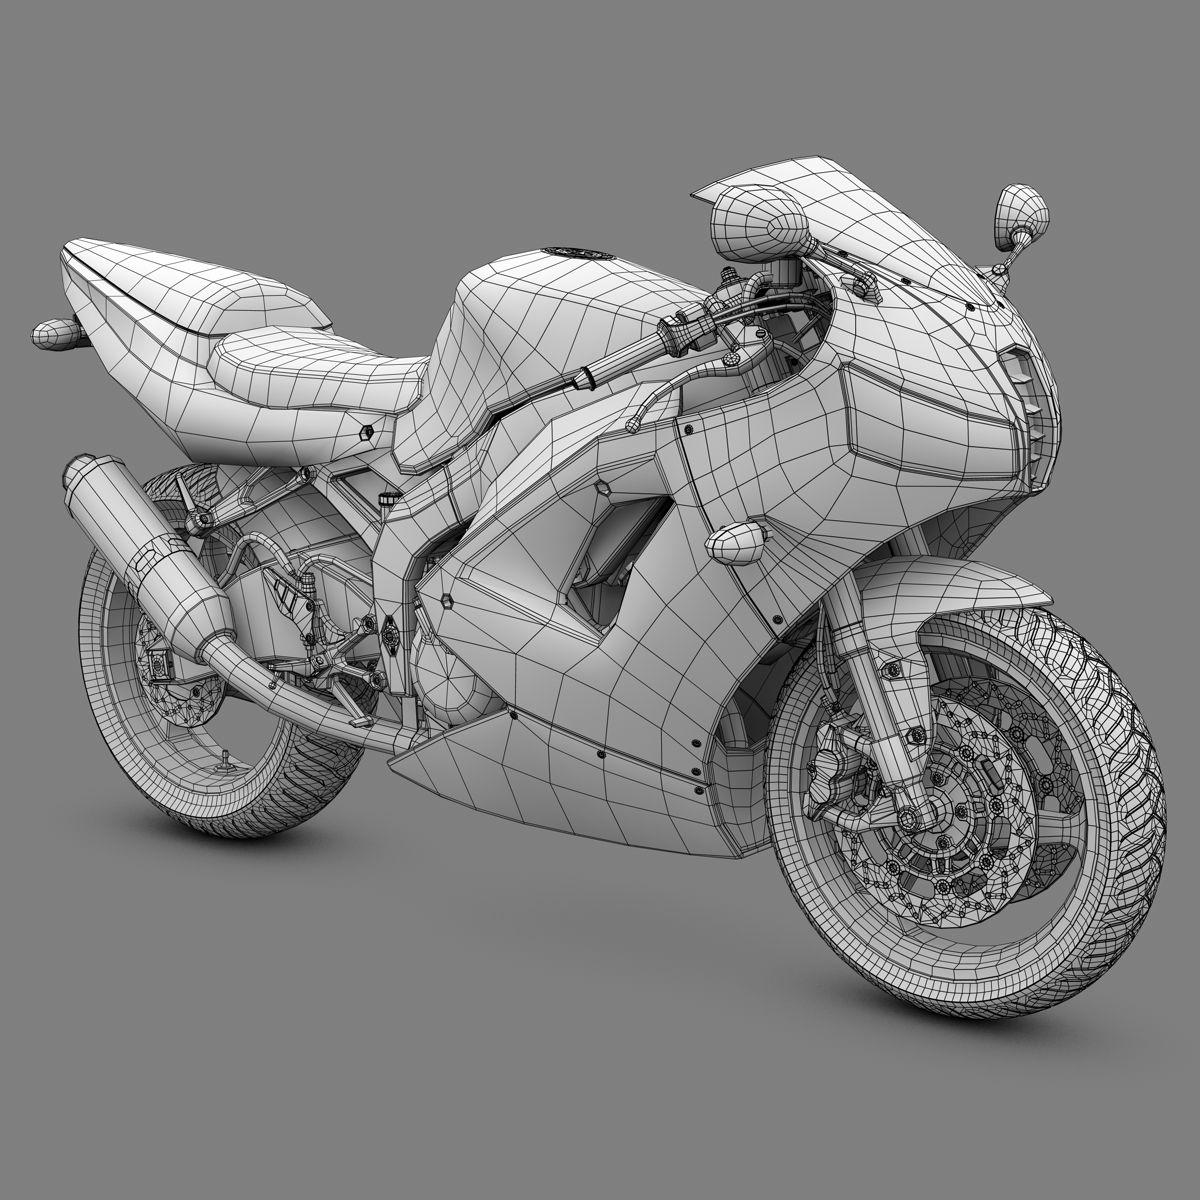 Space Invaders Move X Pix Wallpaper Science Fiction D Drahtgitter 3d Mode 3d Models